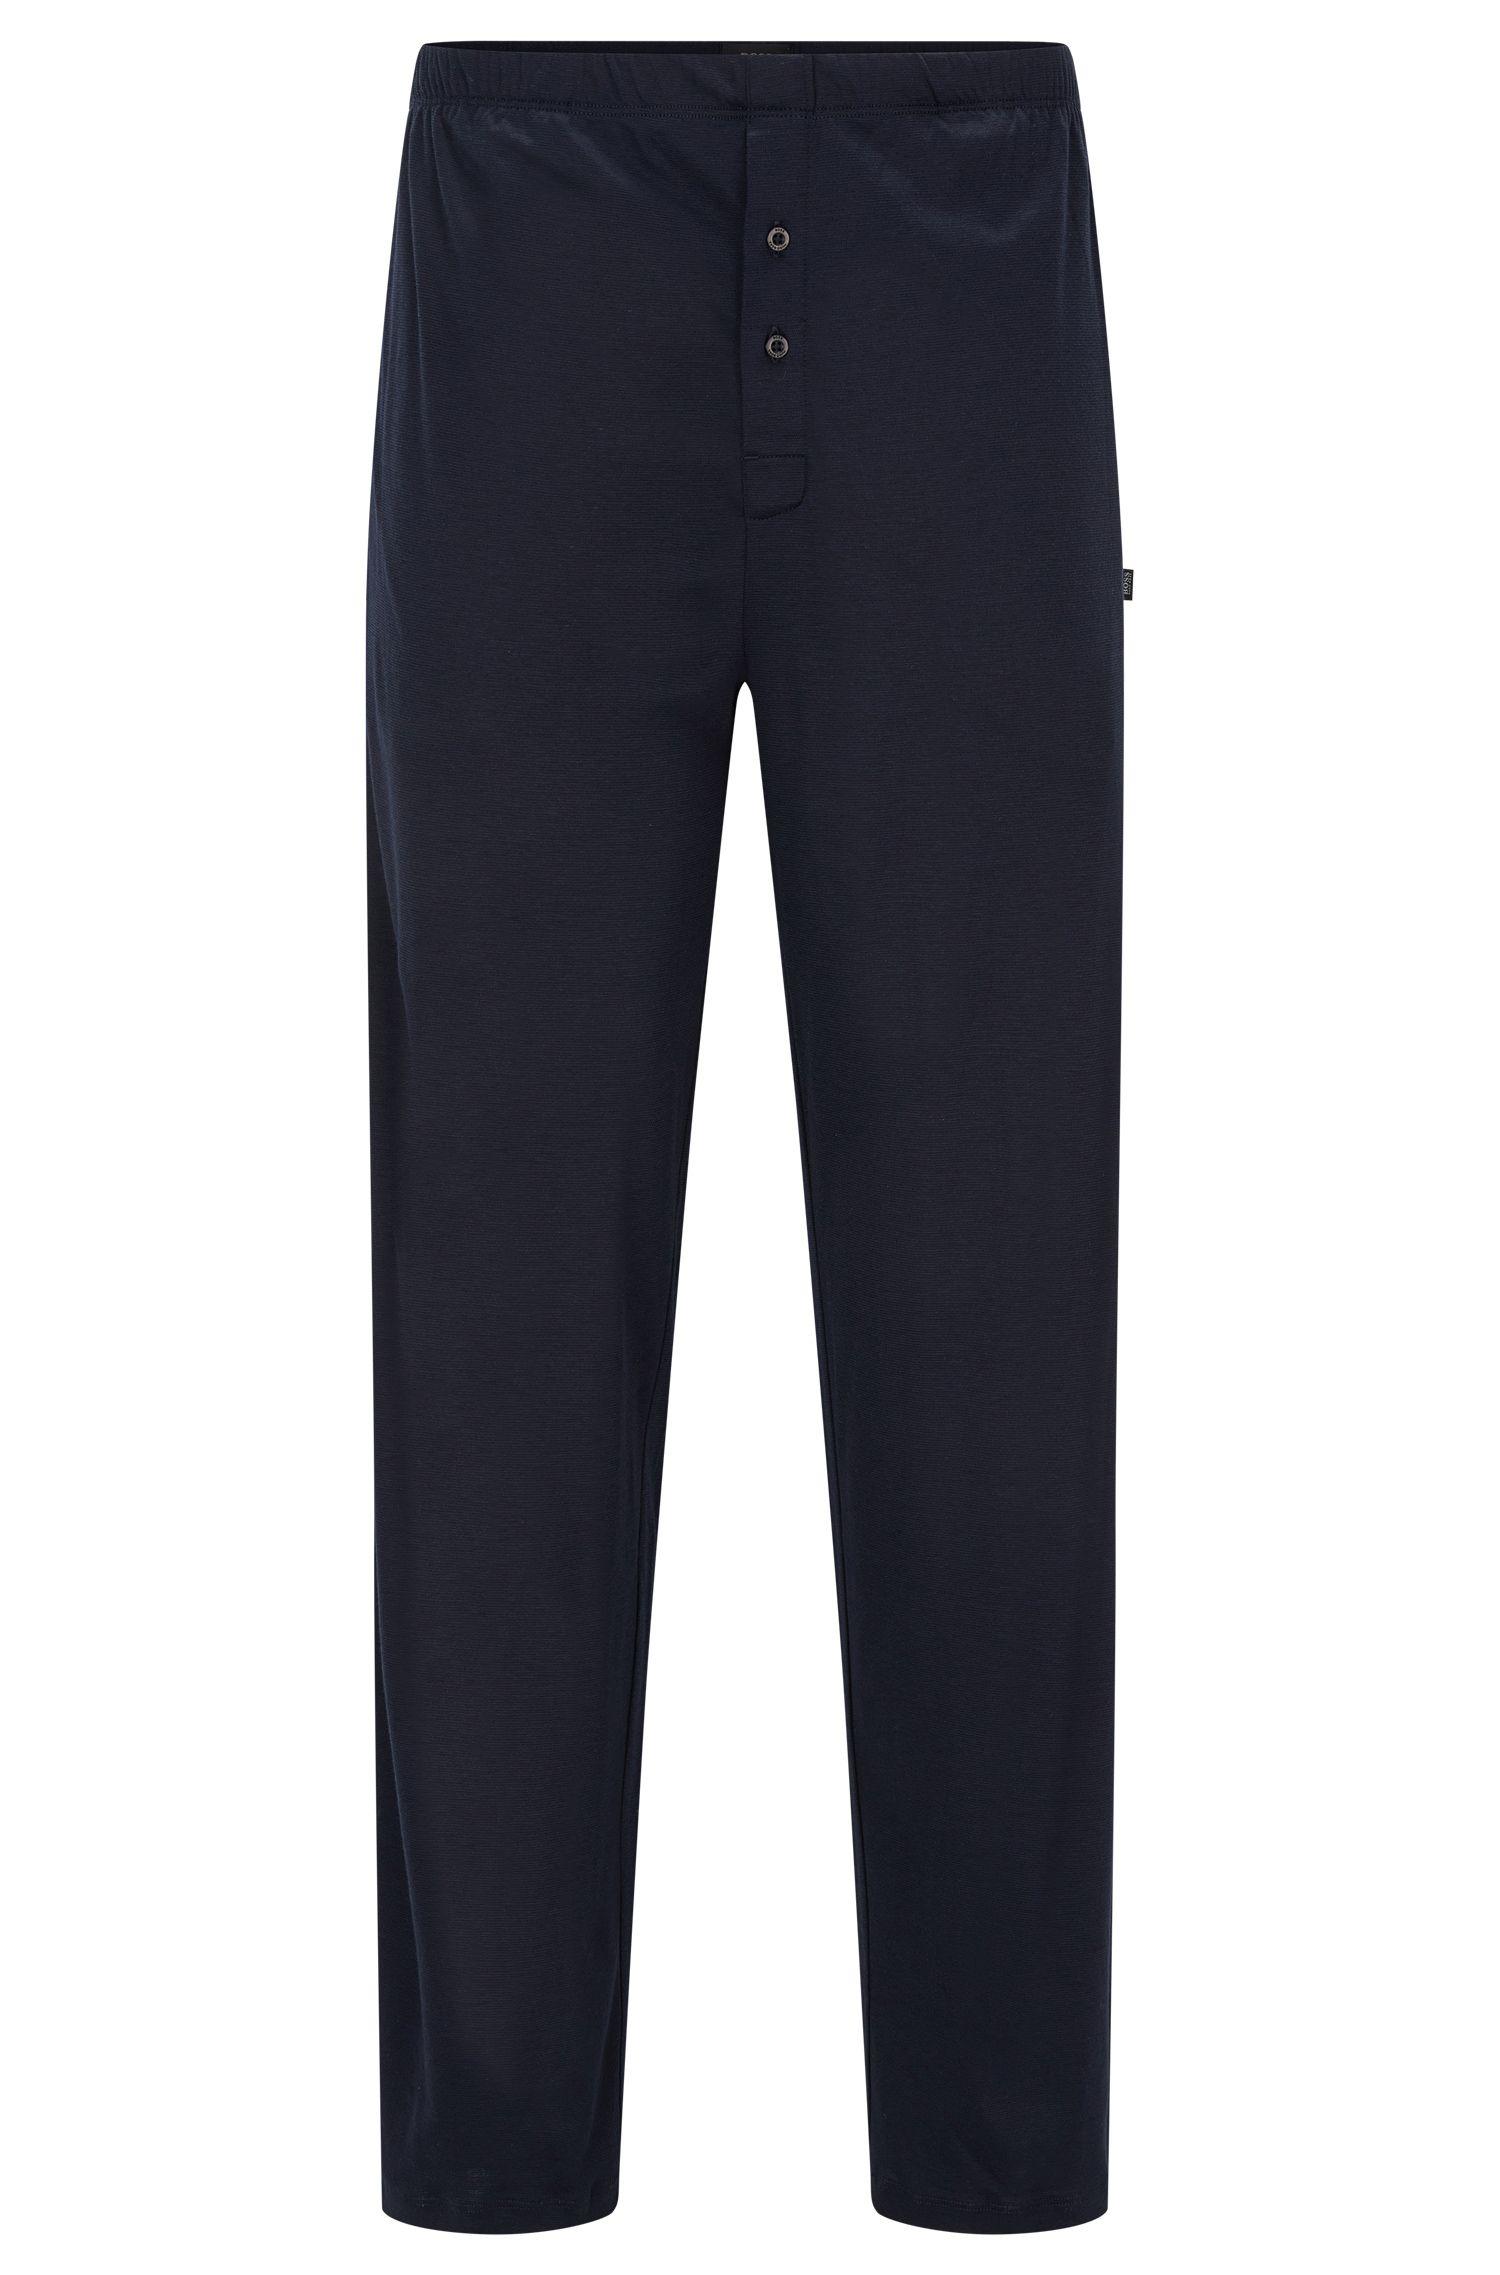 Pyjama-Hose aus Baumwoll-Modal-Mix